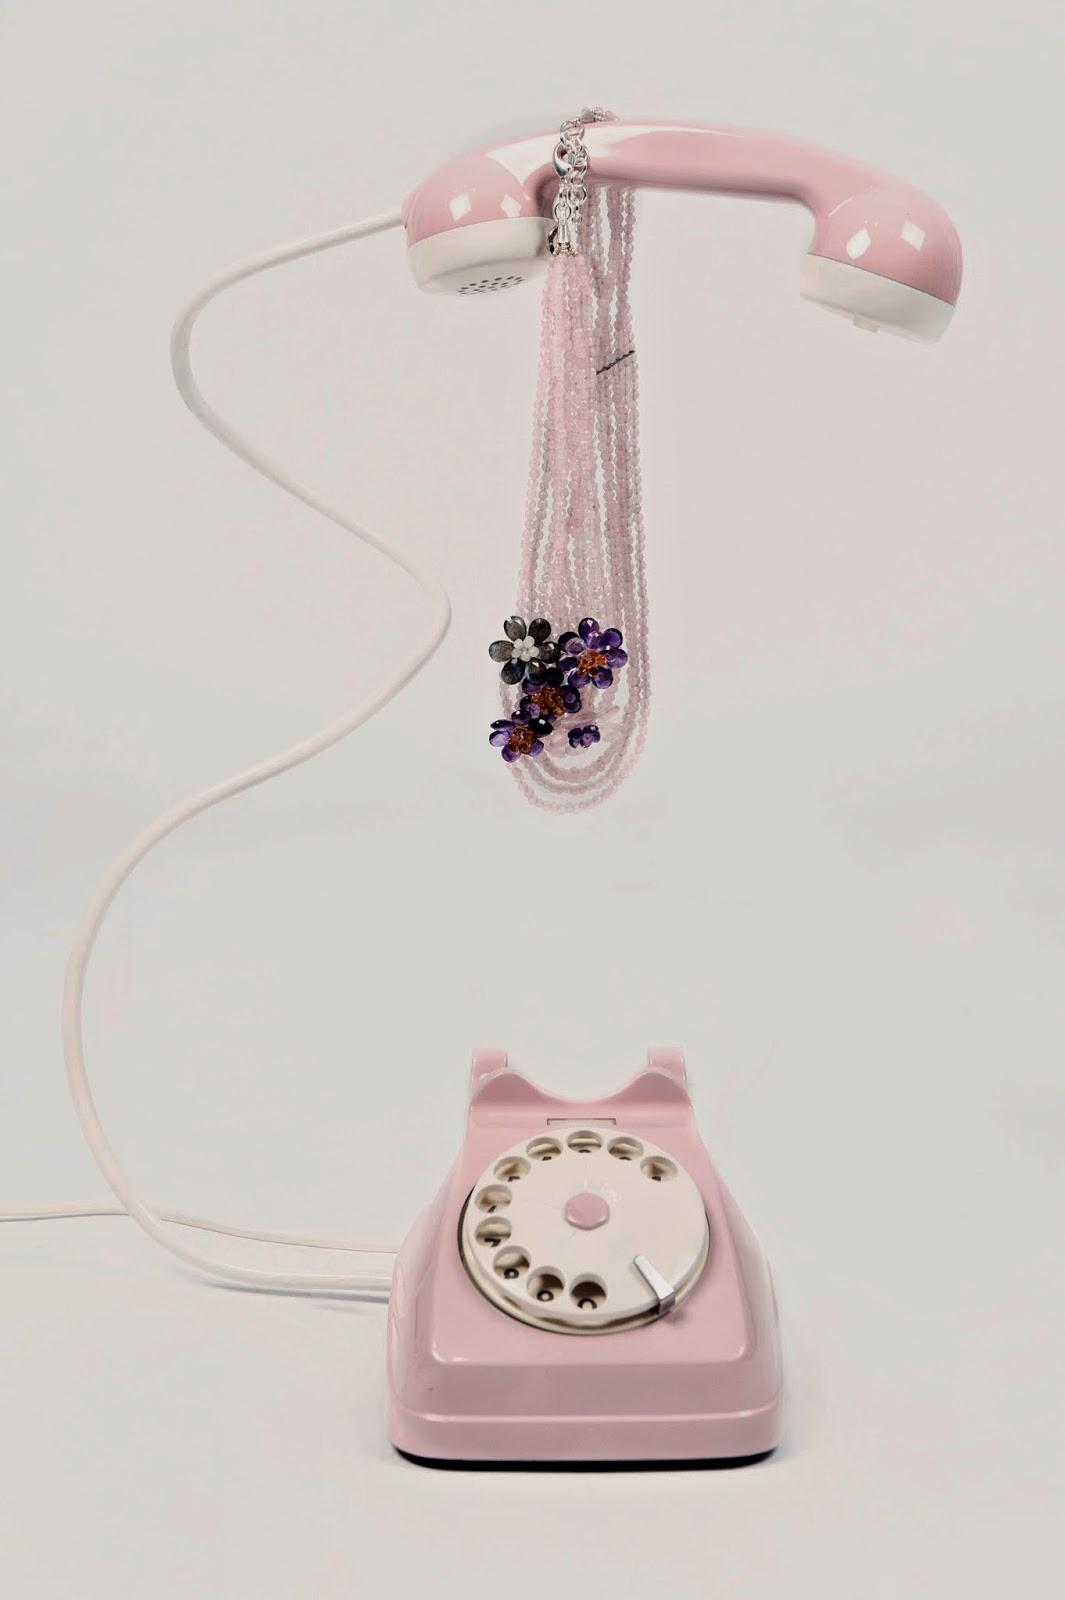 ottaviani, ilaria morelli,stand out fashion project, mad zone